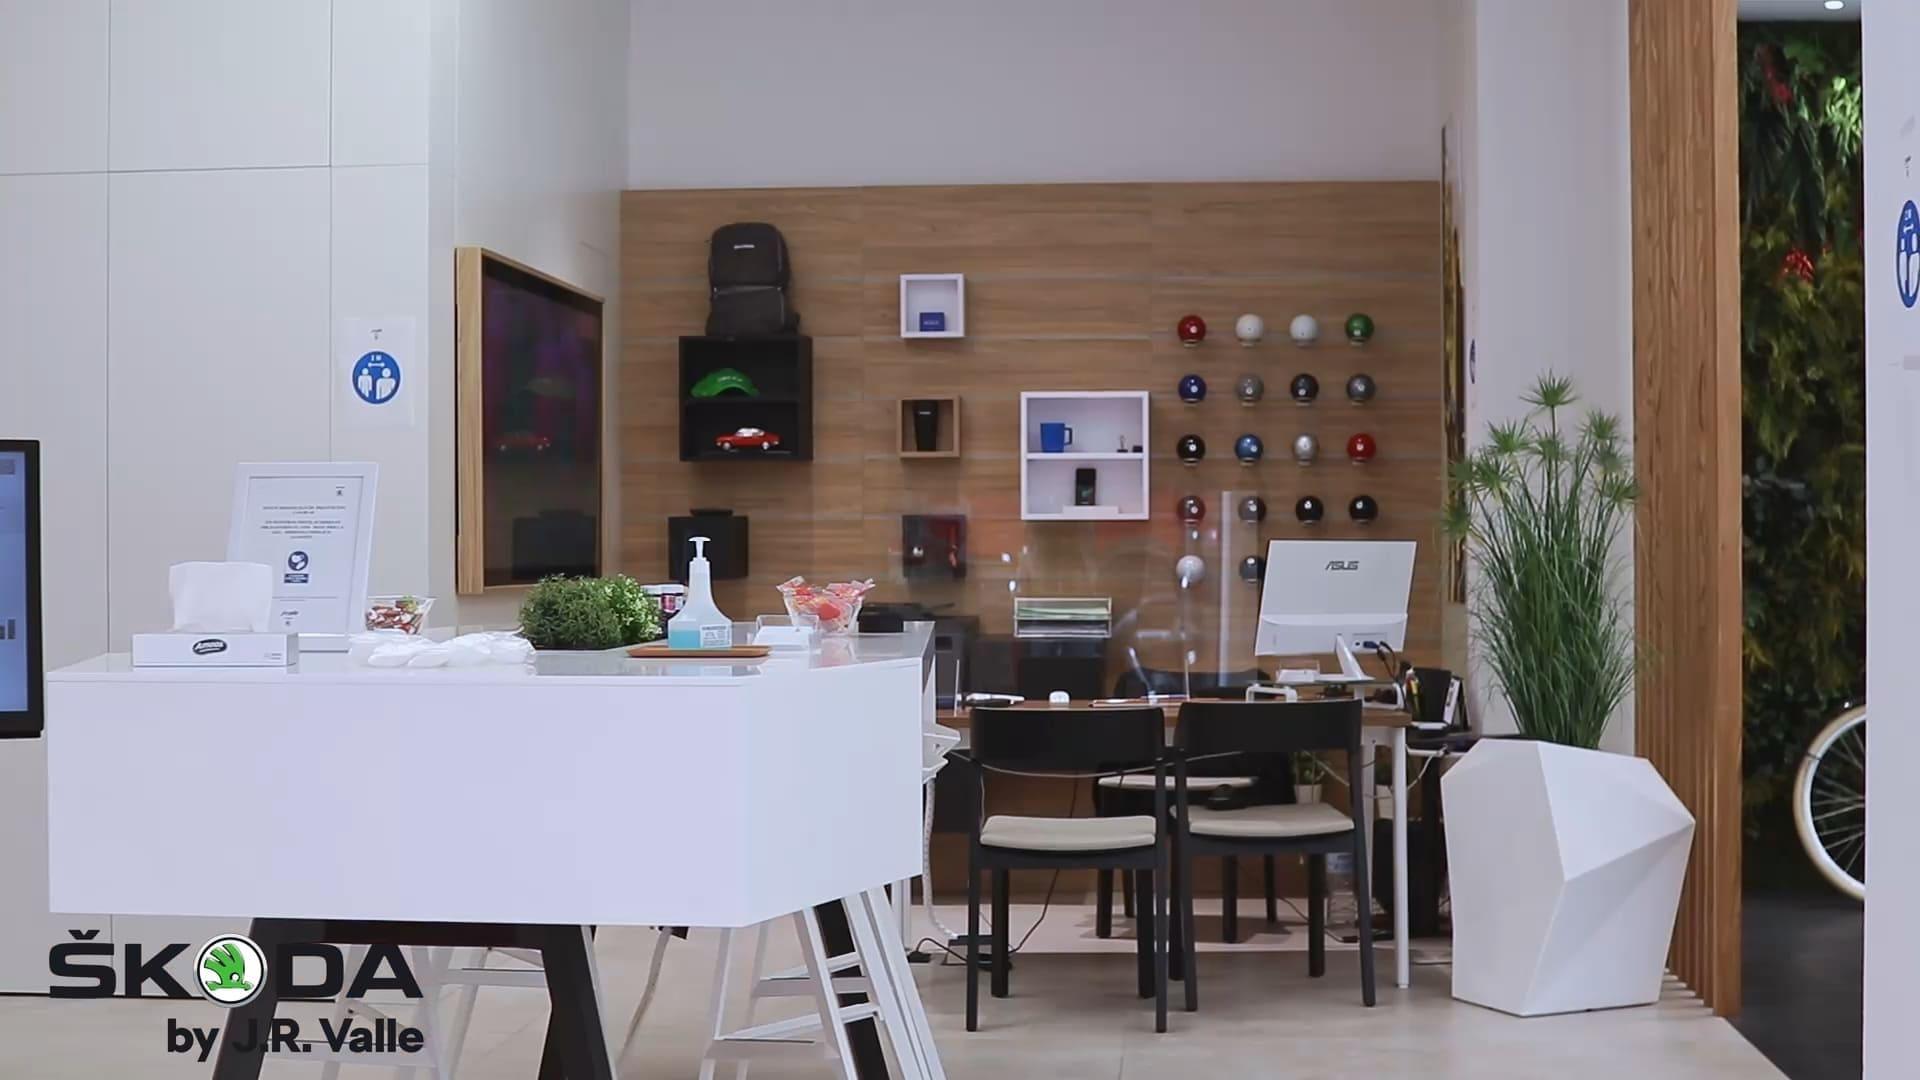 interior-Skoda-City-Store-Valencia-J.R.-Valle